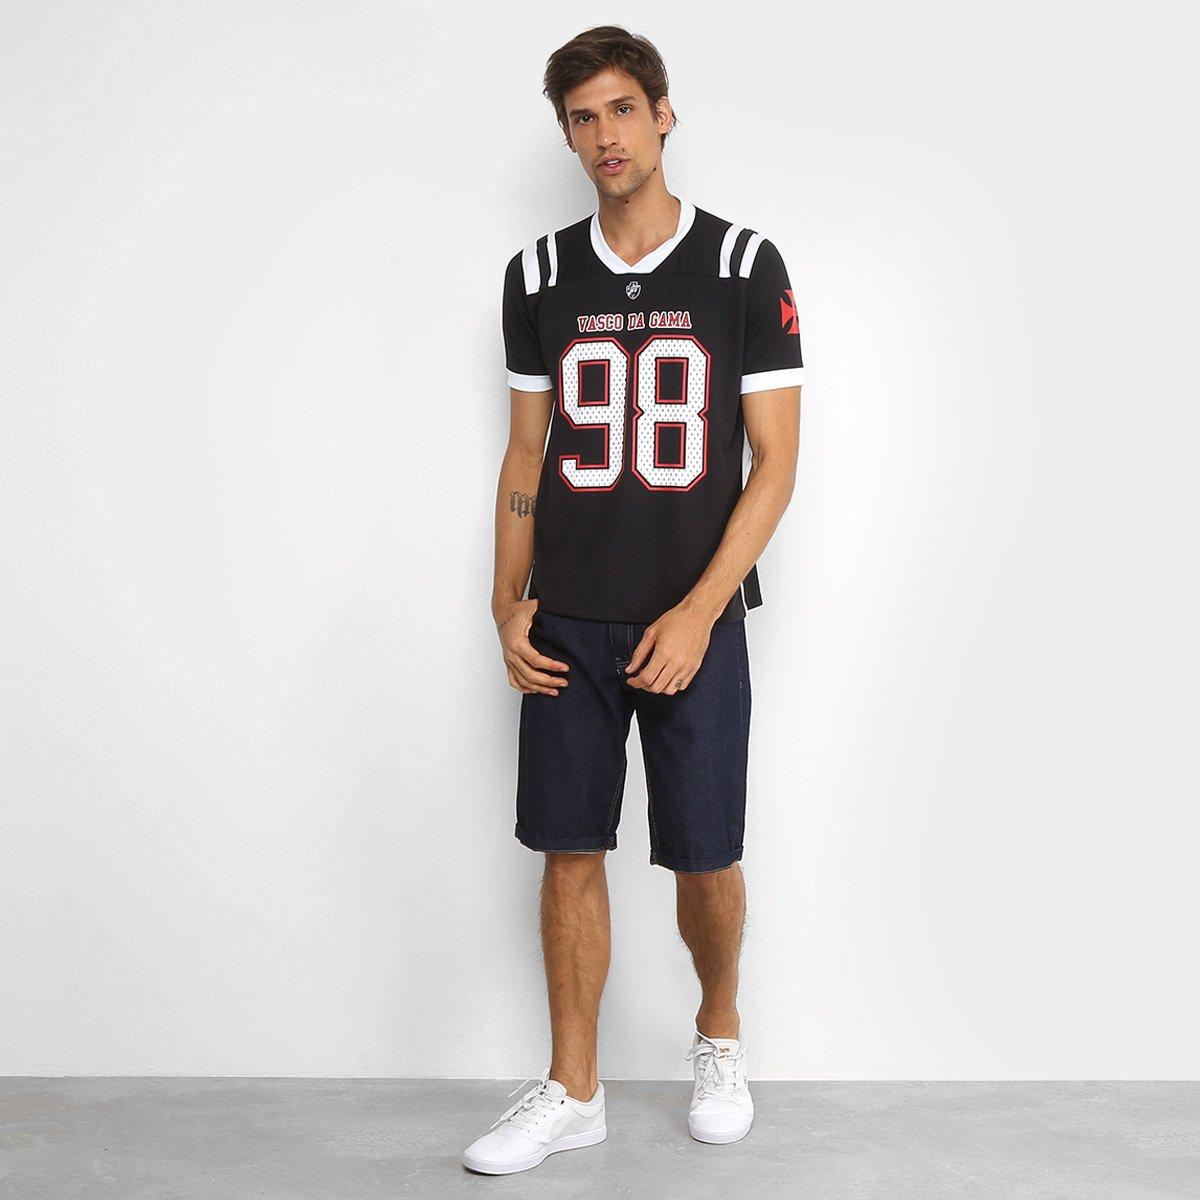 Camiseta Vasco Breed Masculina - Compre Agora  911297c7b3413